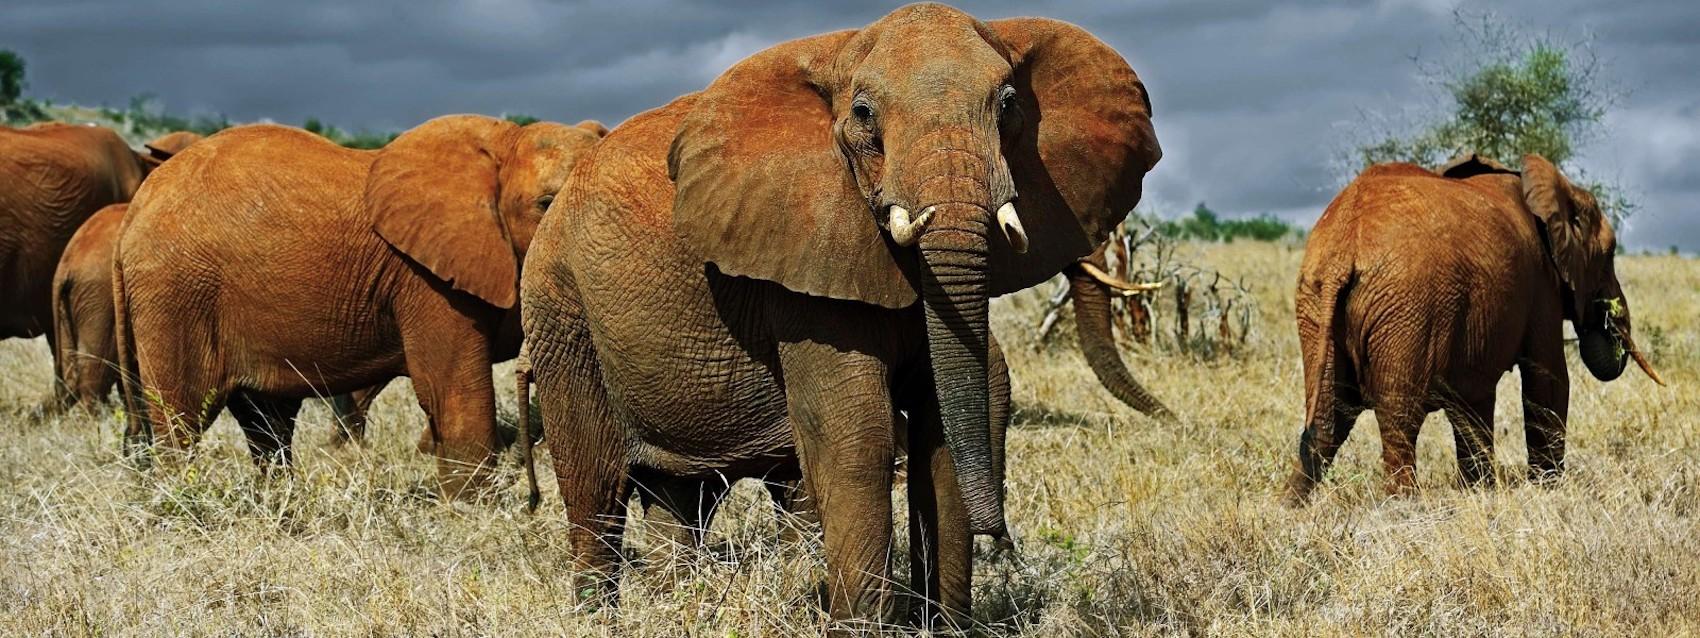 Short Safari from Mombasa | Mombasa Safari Tours